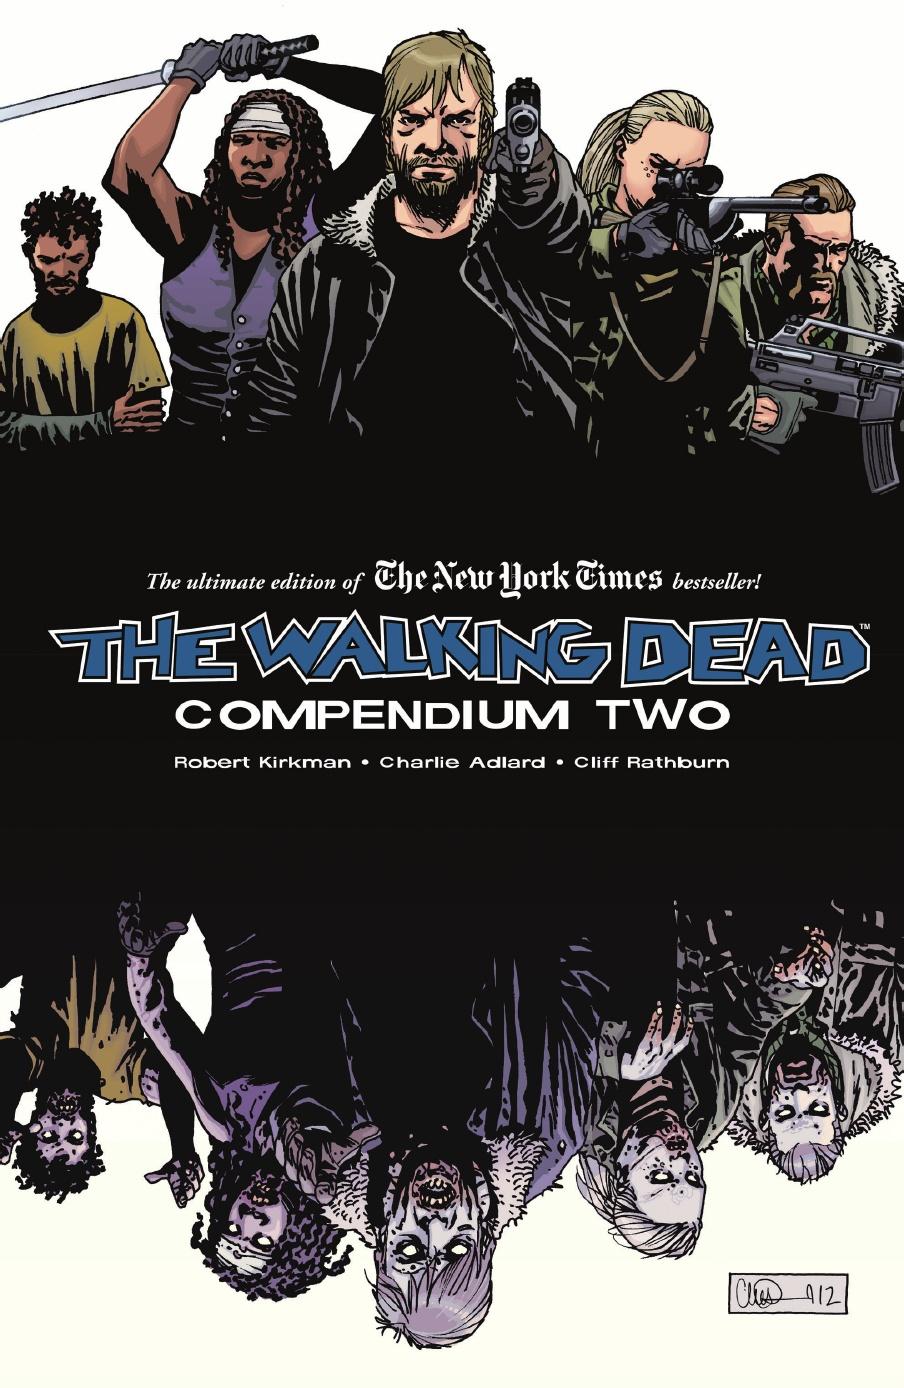 comic book gift ideas - Walking Dead Compendium